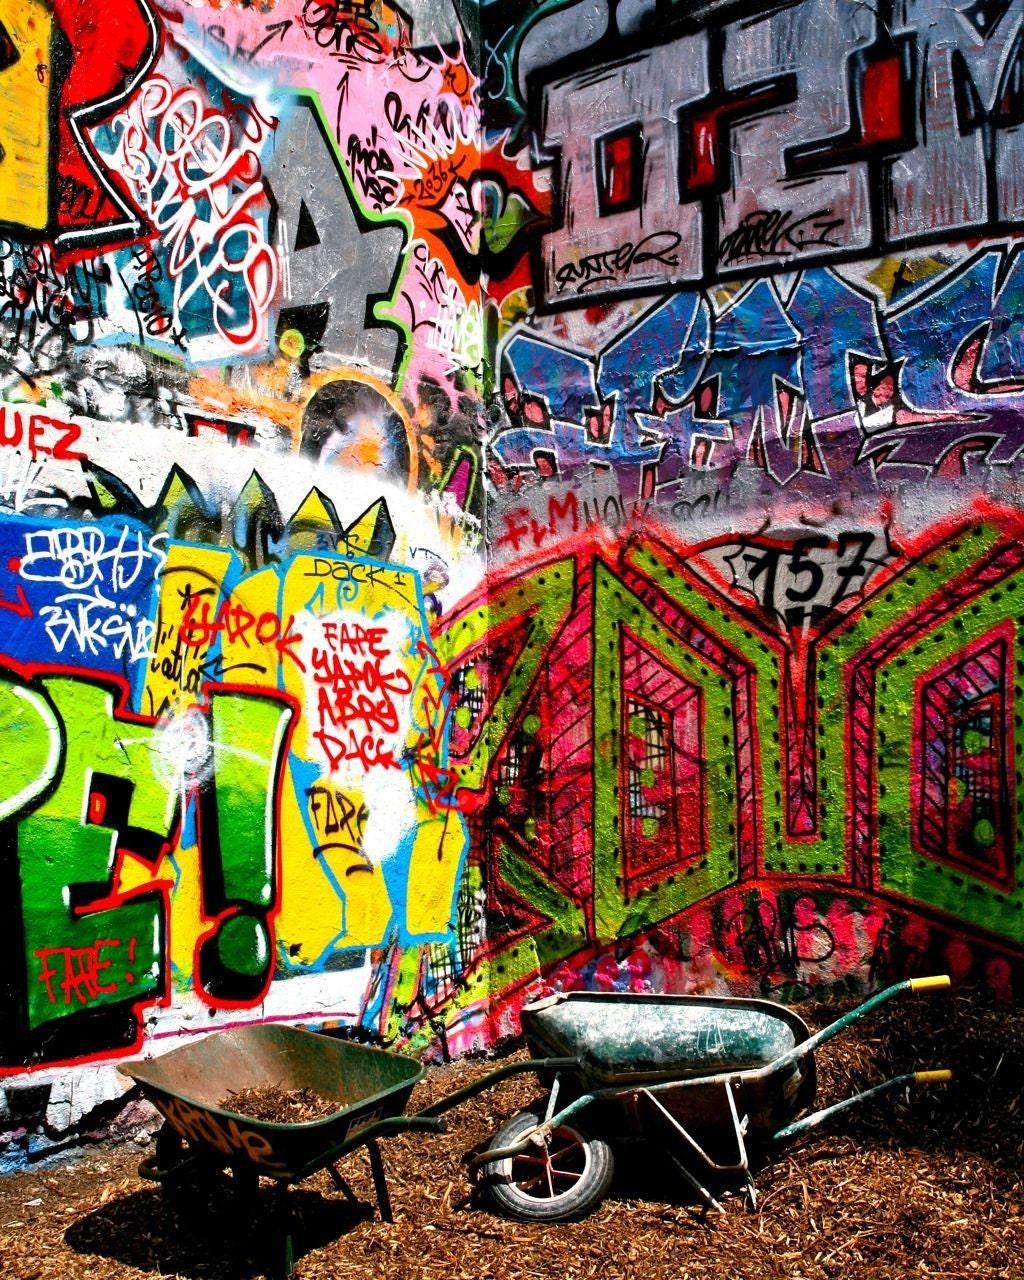 Paris Street Art 1 - 8 x 10 Photograph